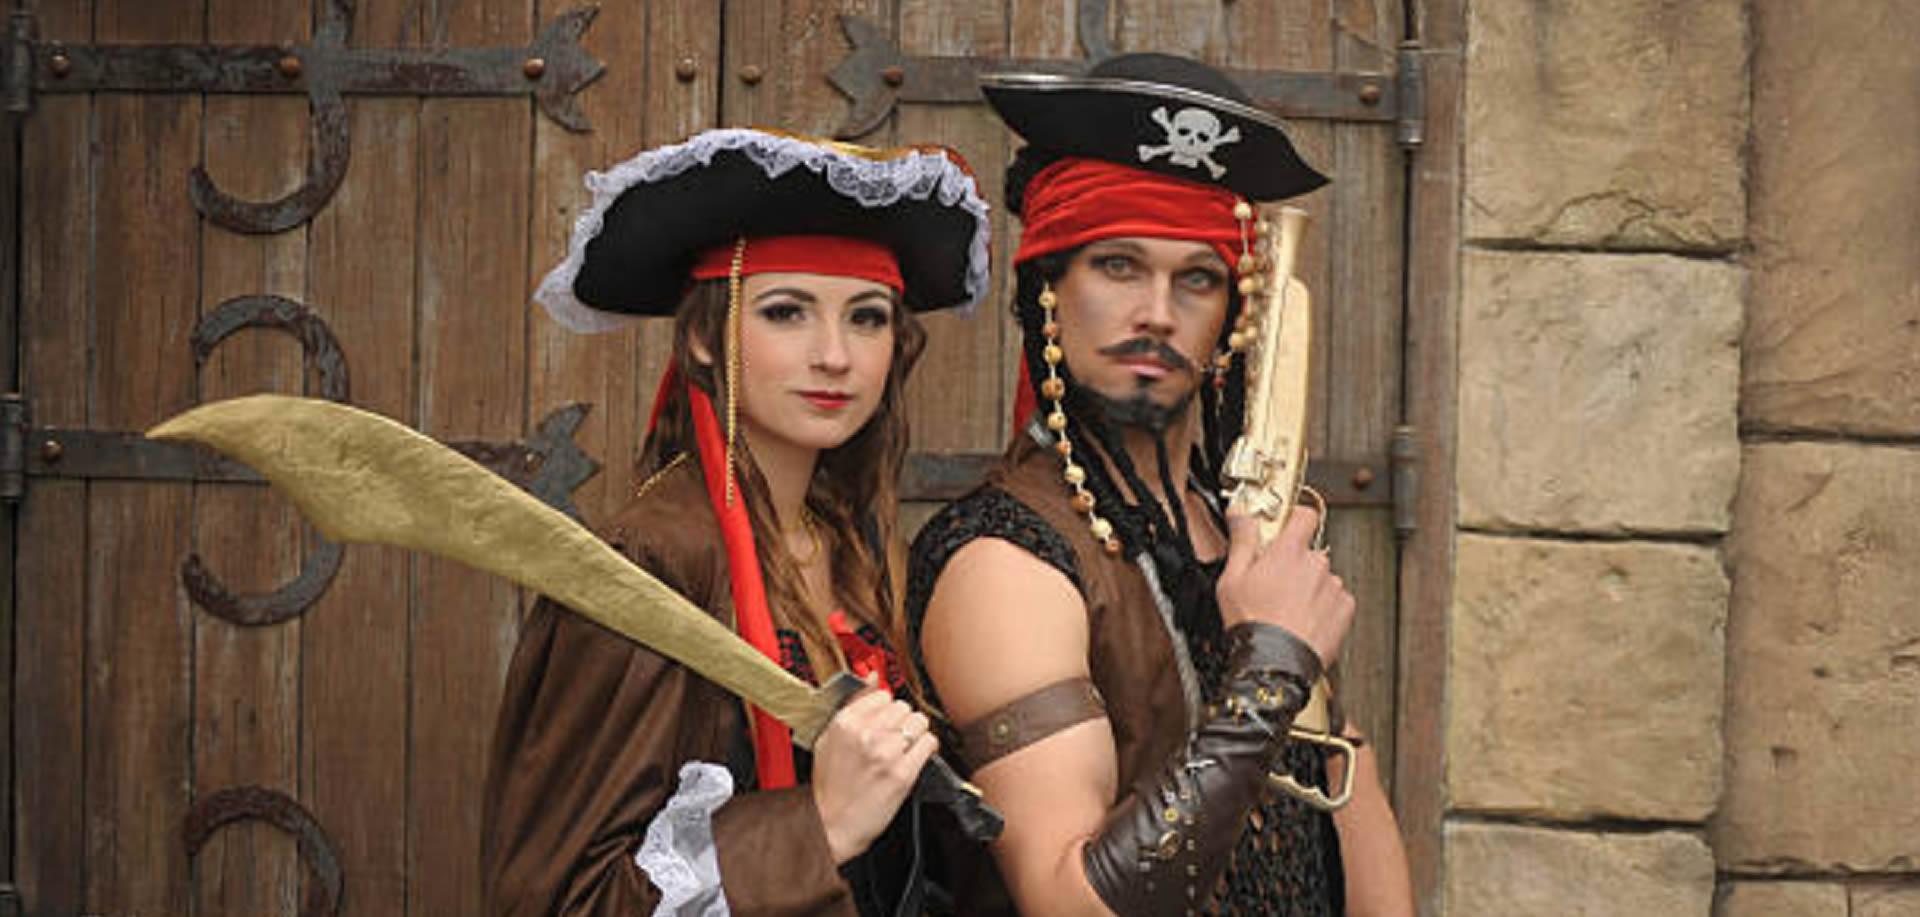 imagen principal de piratas